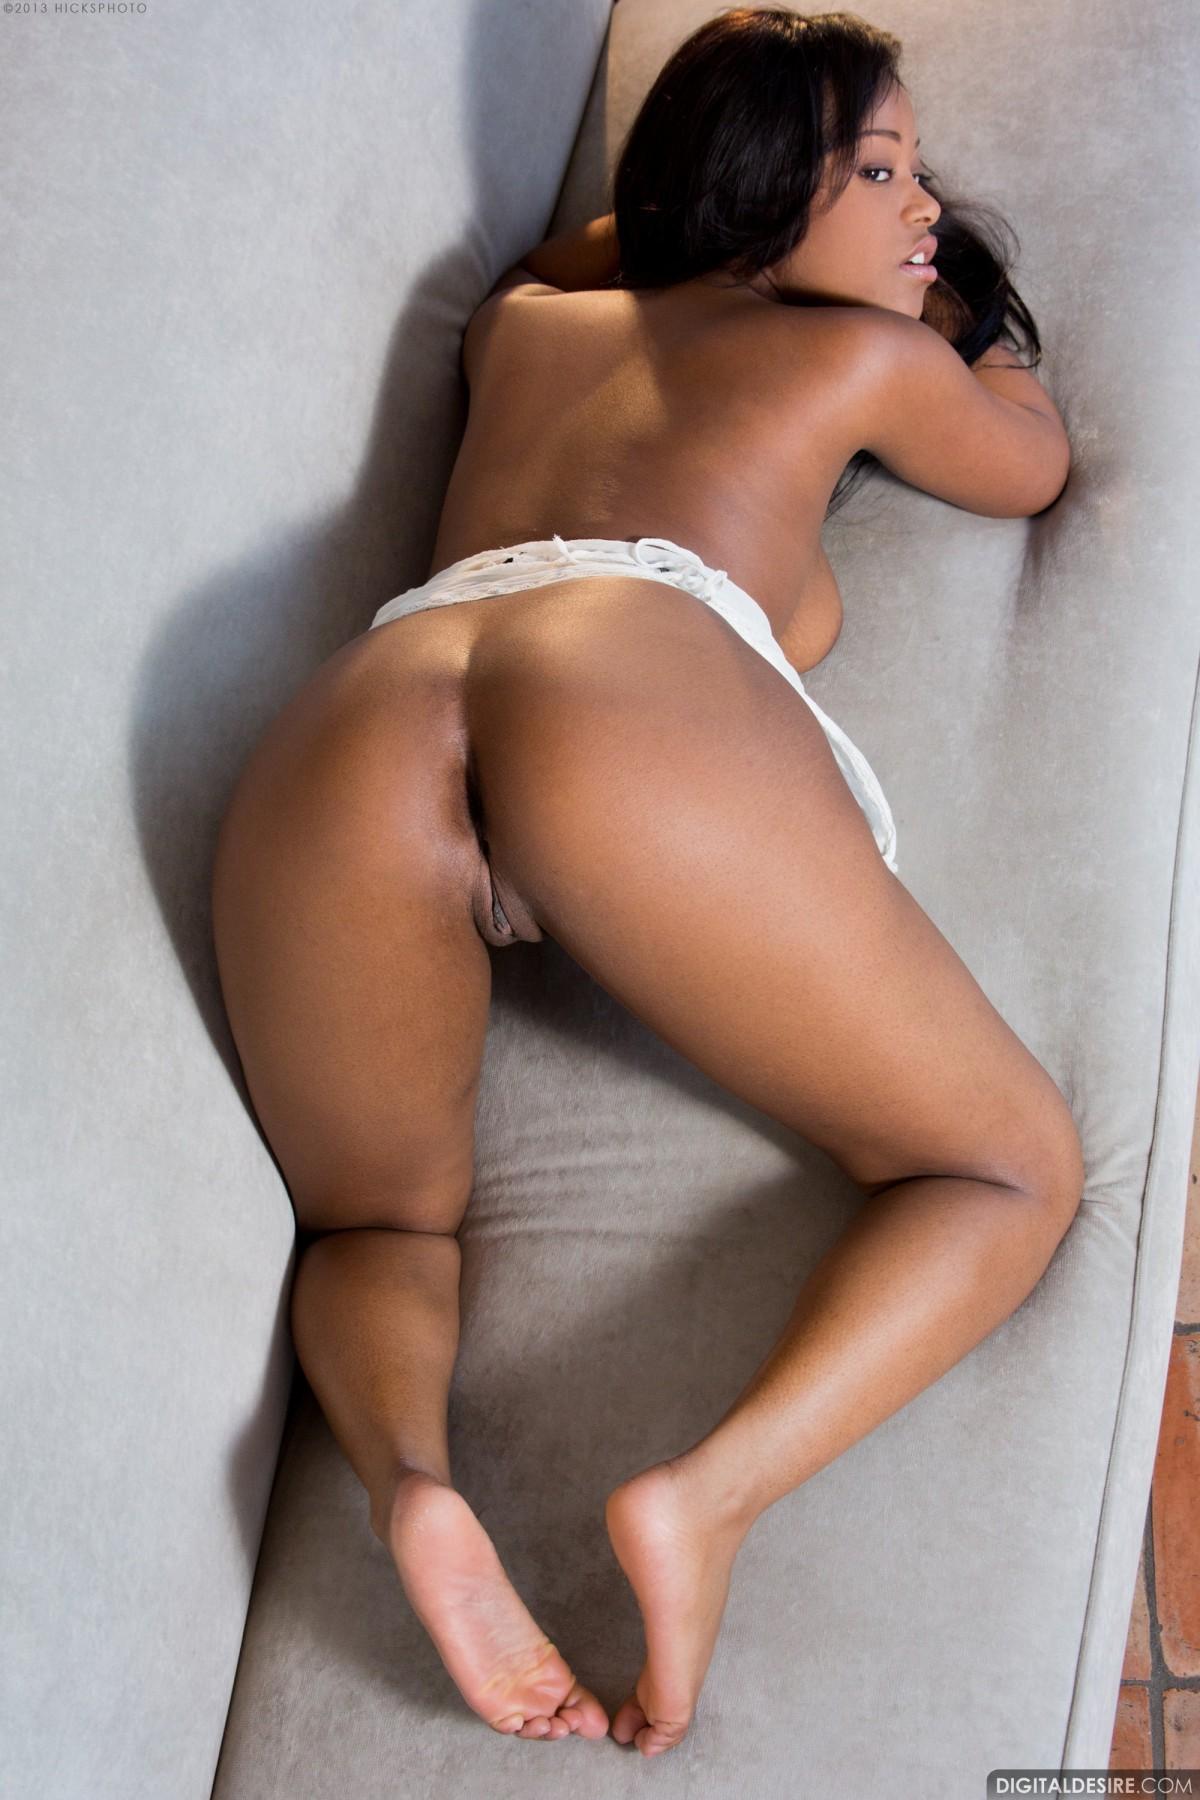 Чернокожие сучки фото 4 фотография